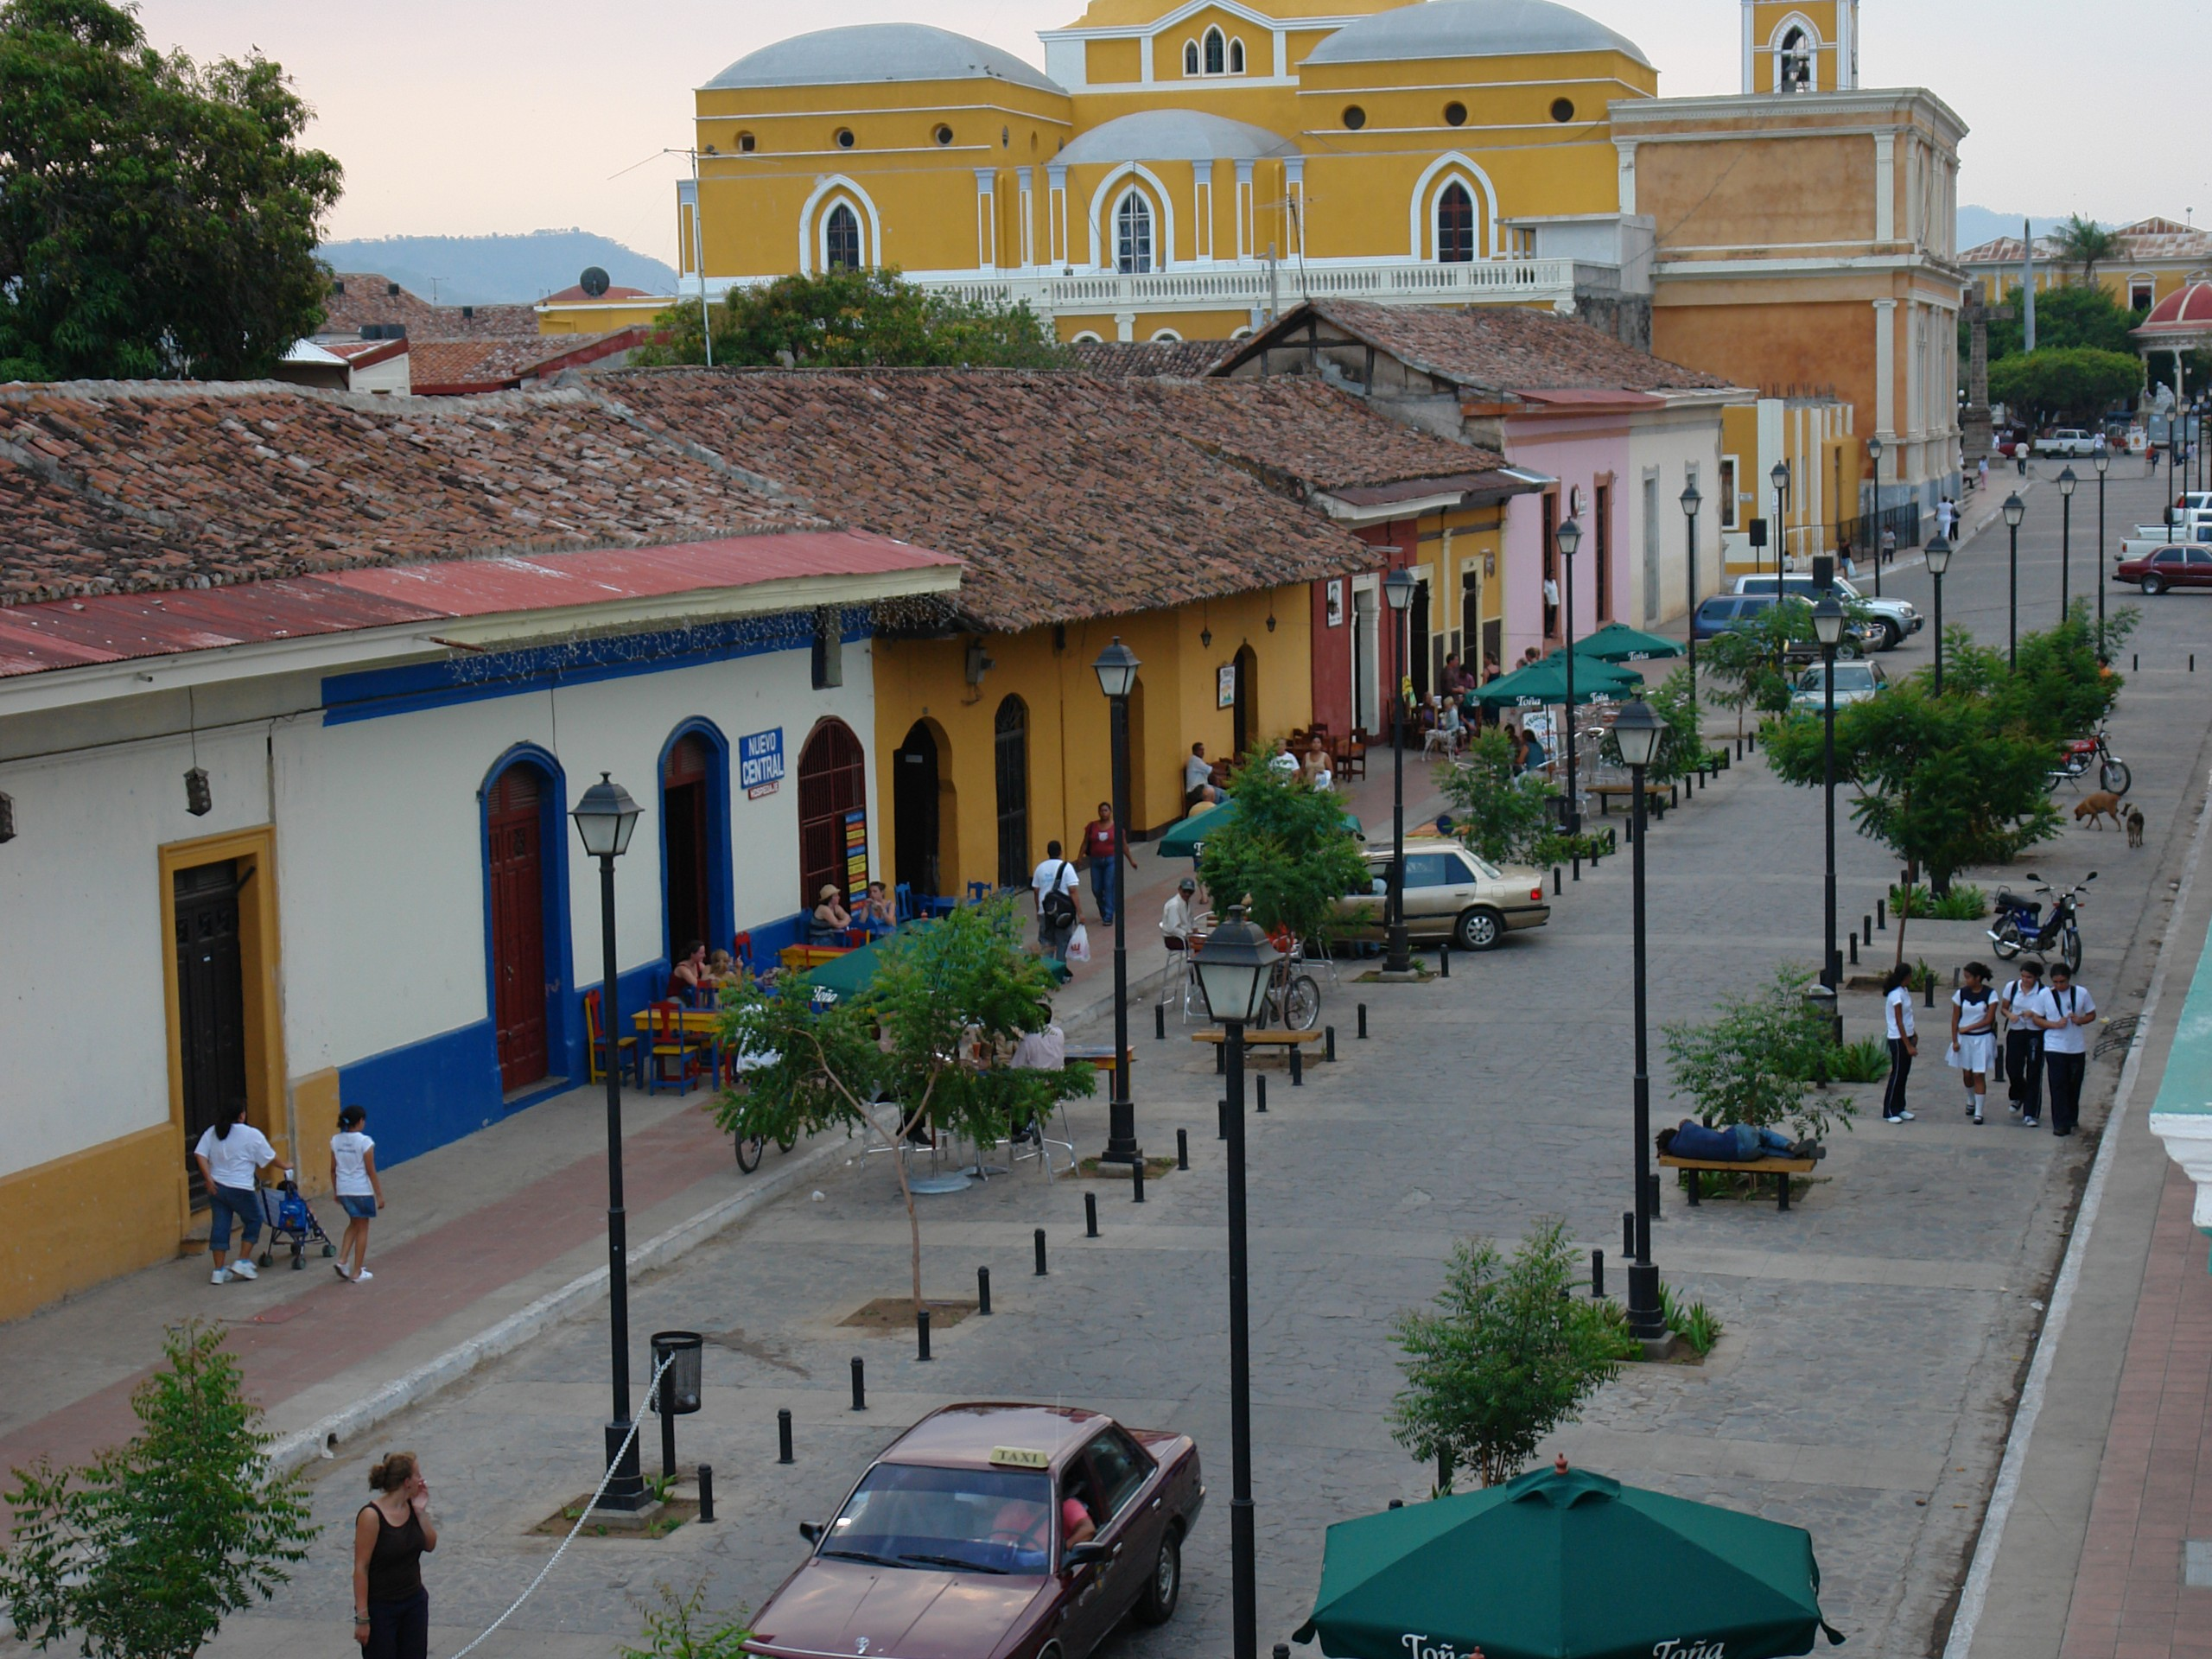 Calzada Street in Granada